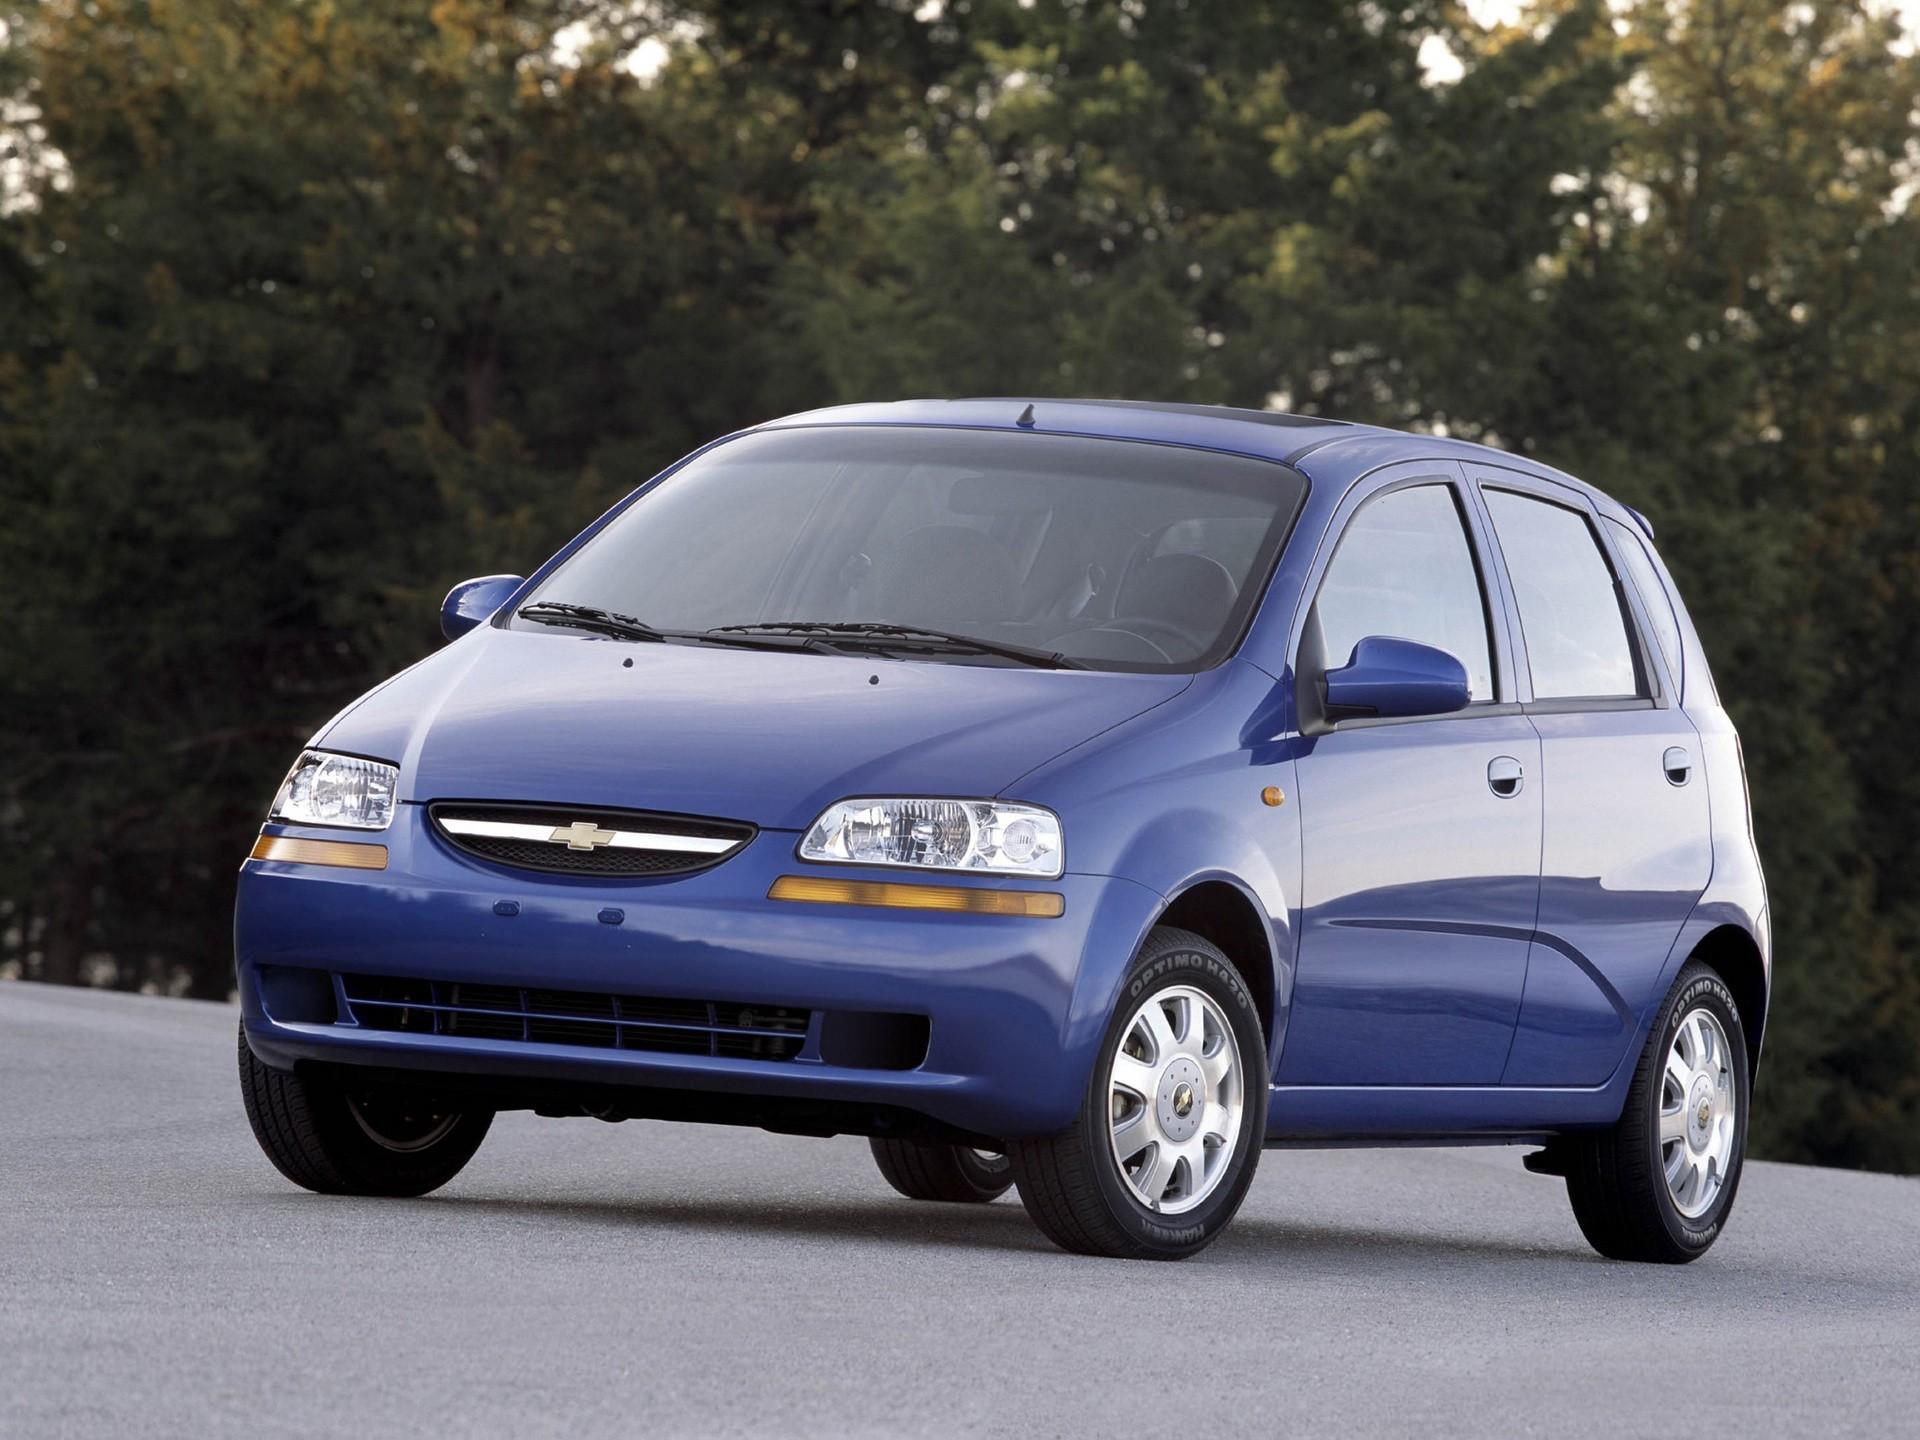 Chevrolet Aveo Kalos 5 Doors 2002 2003 2004 2005 2006 2007 Autoevolution